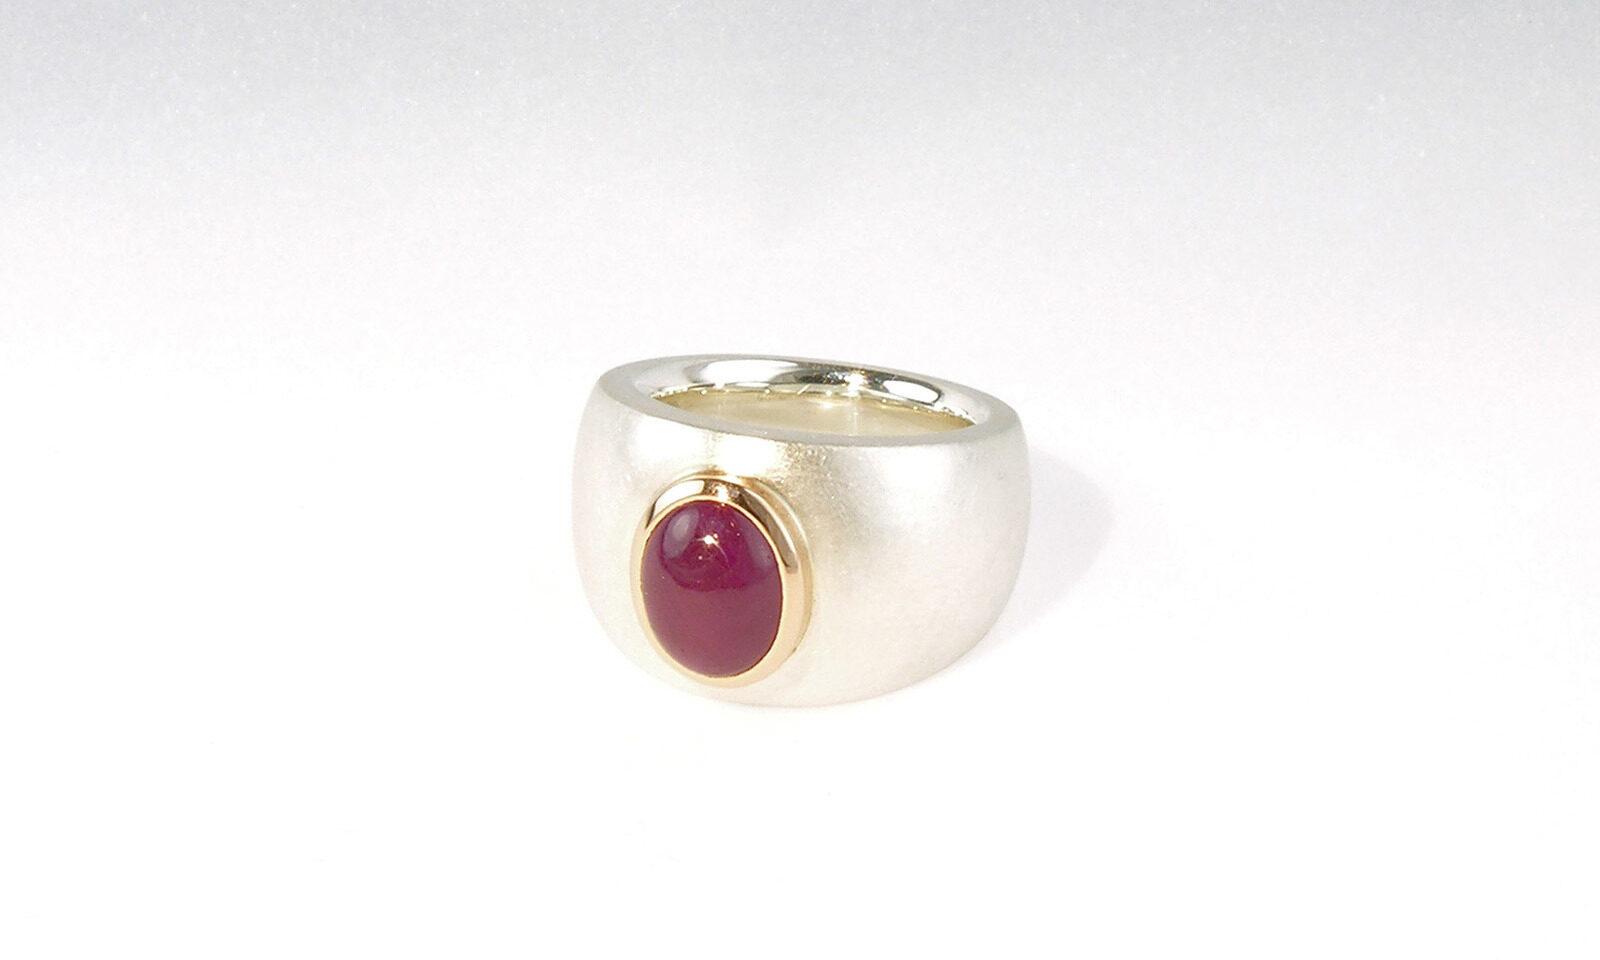 Ring Rubin Silber. Ring Silber 925 und Rotgold 750 mit Rubin Cabochon 3.28 ct., CHF 2800.-